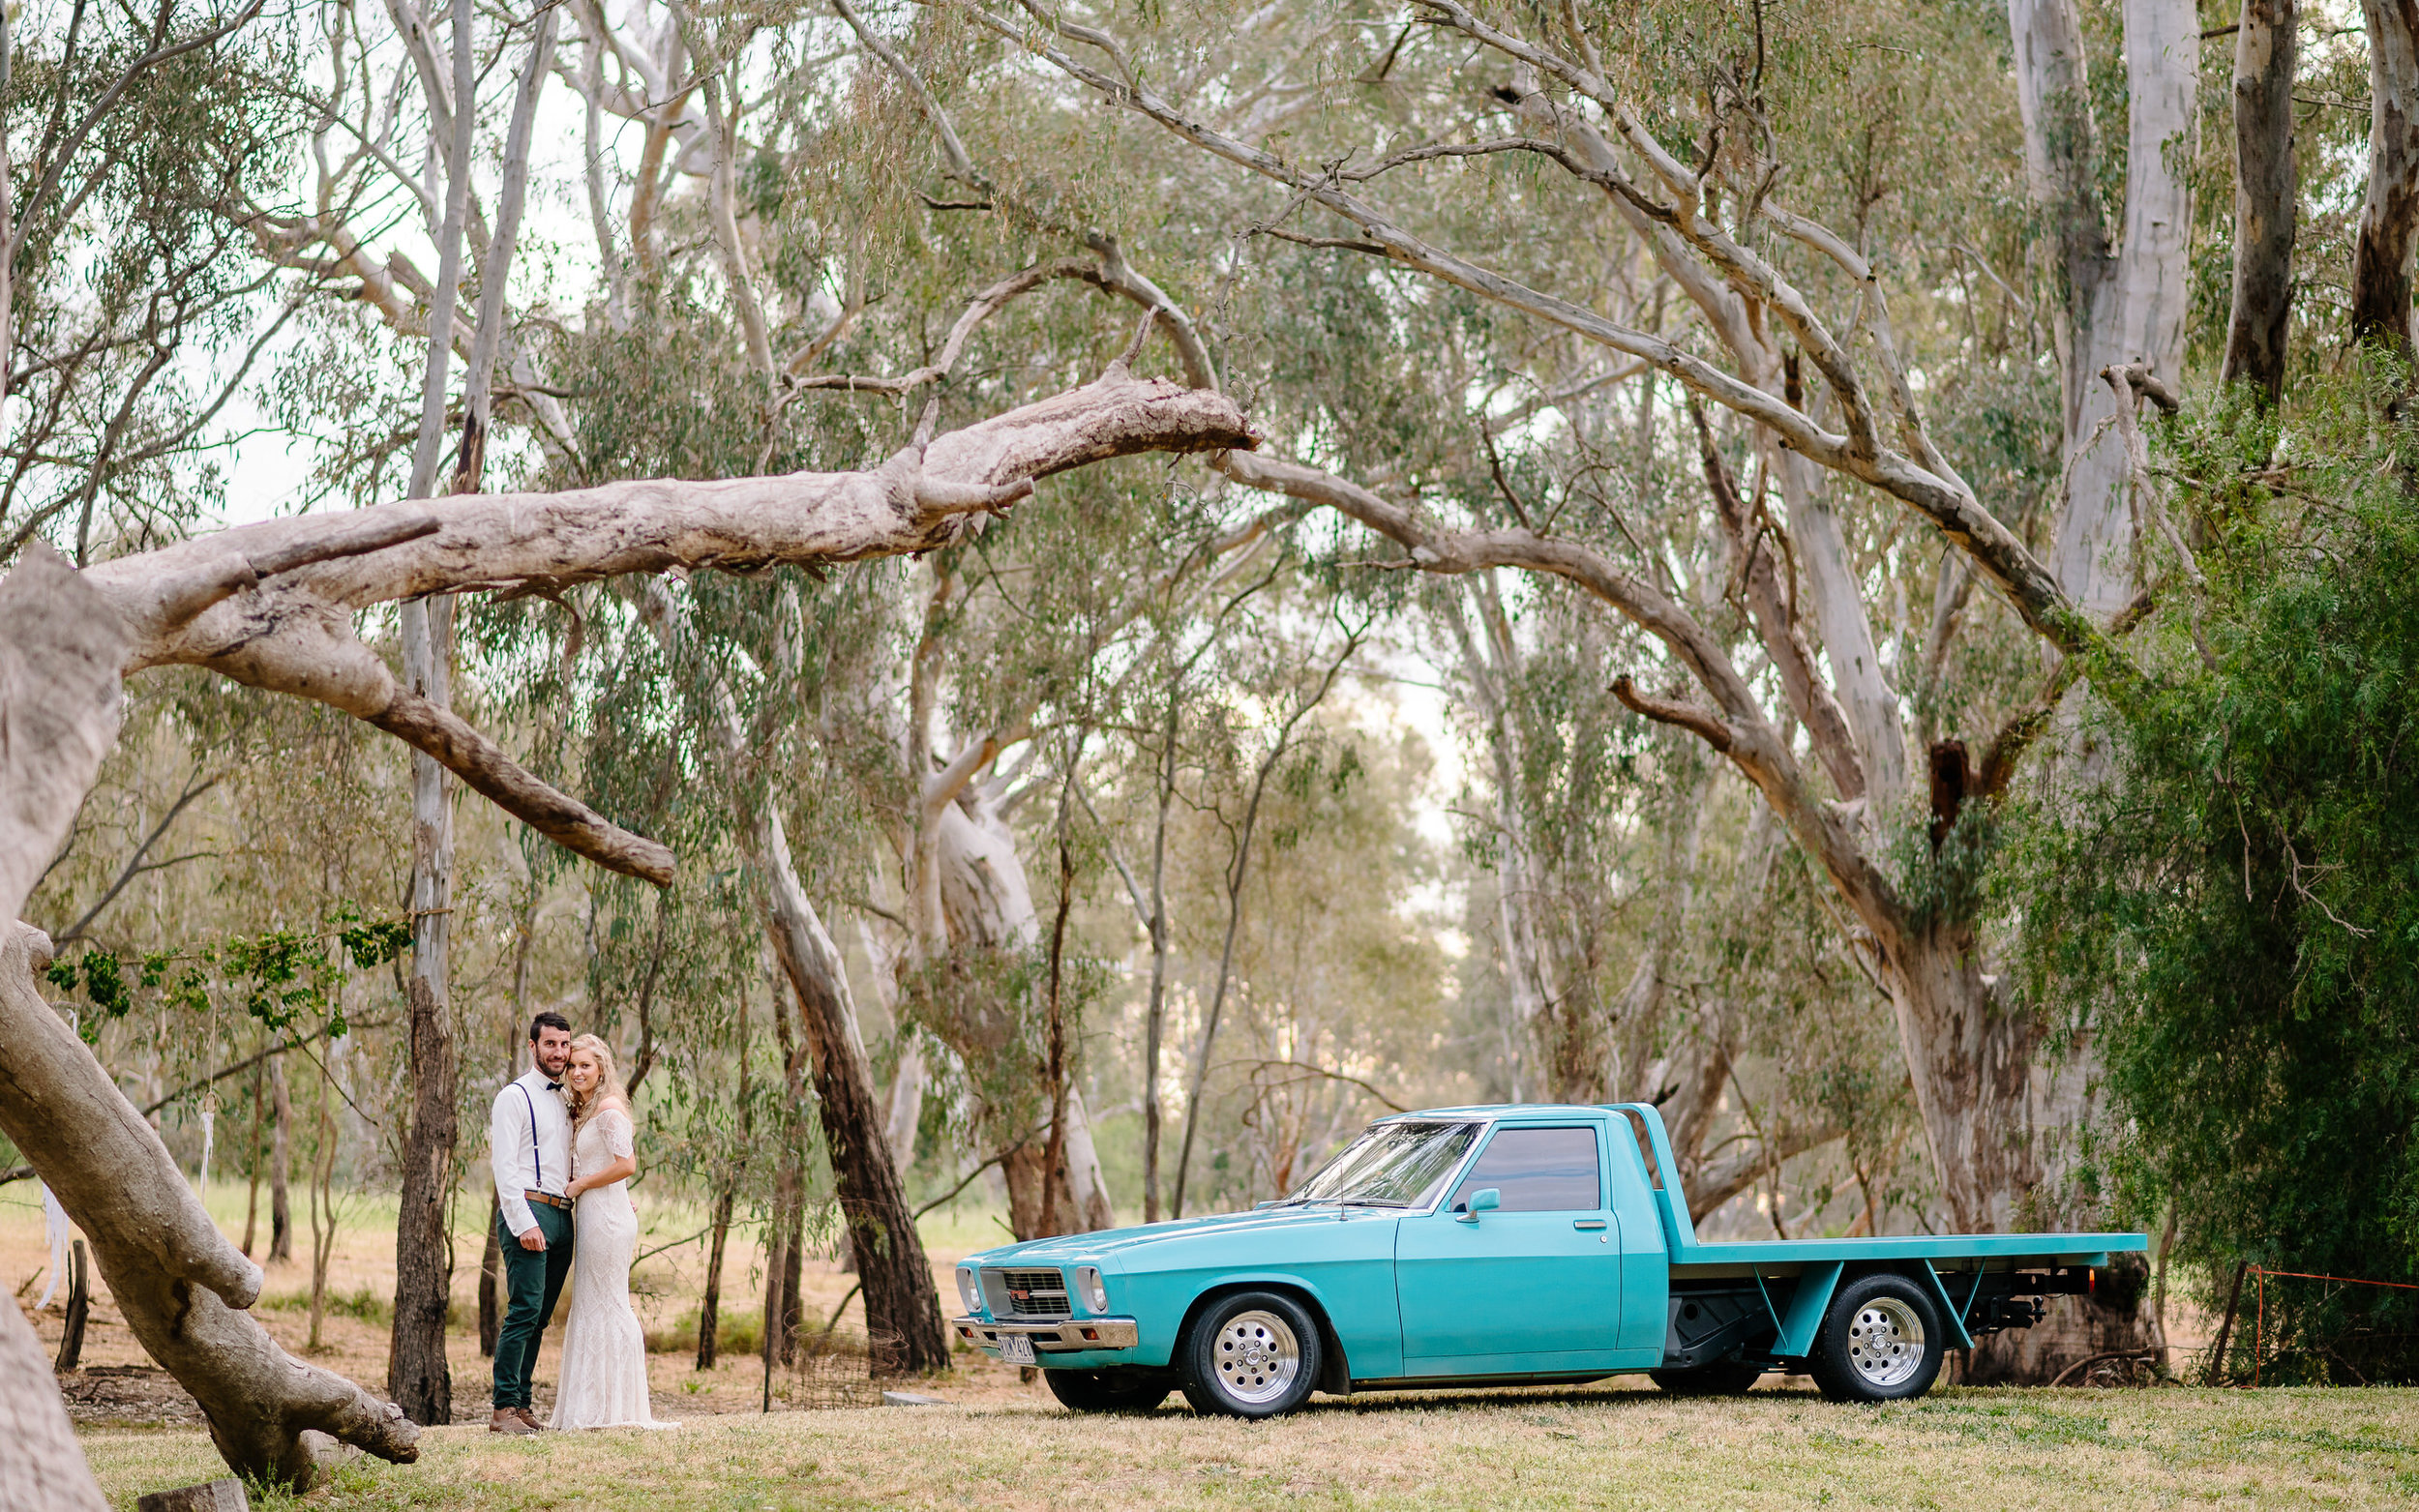 Justin_And_Jim_Photography_Backyard_Wedding220.JPG